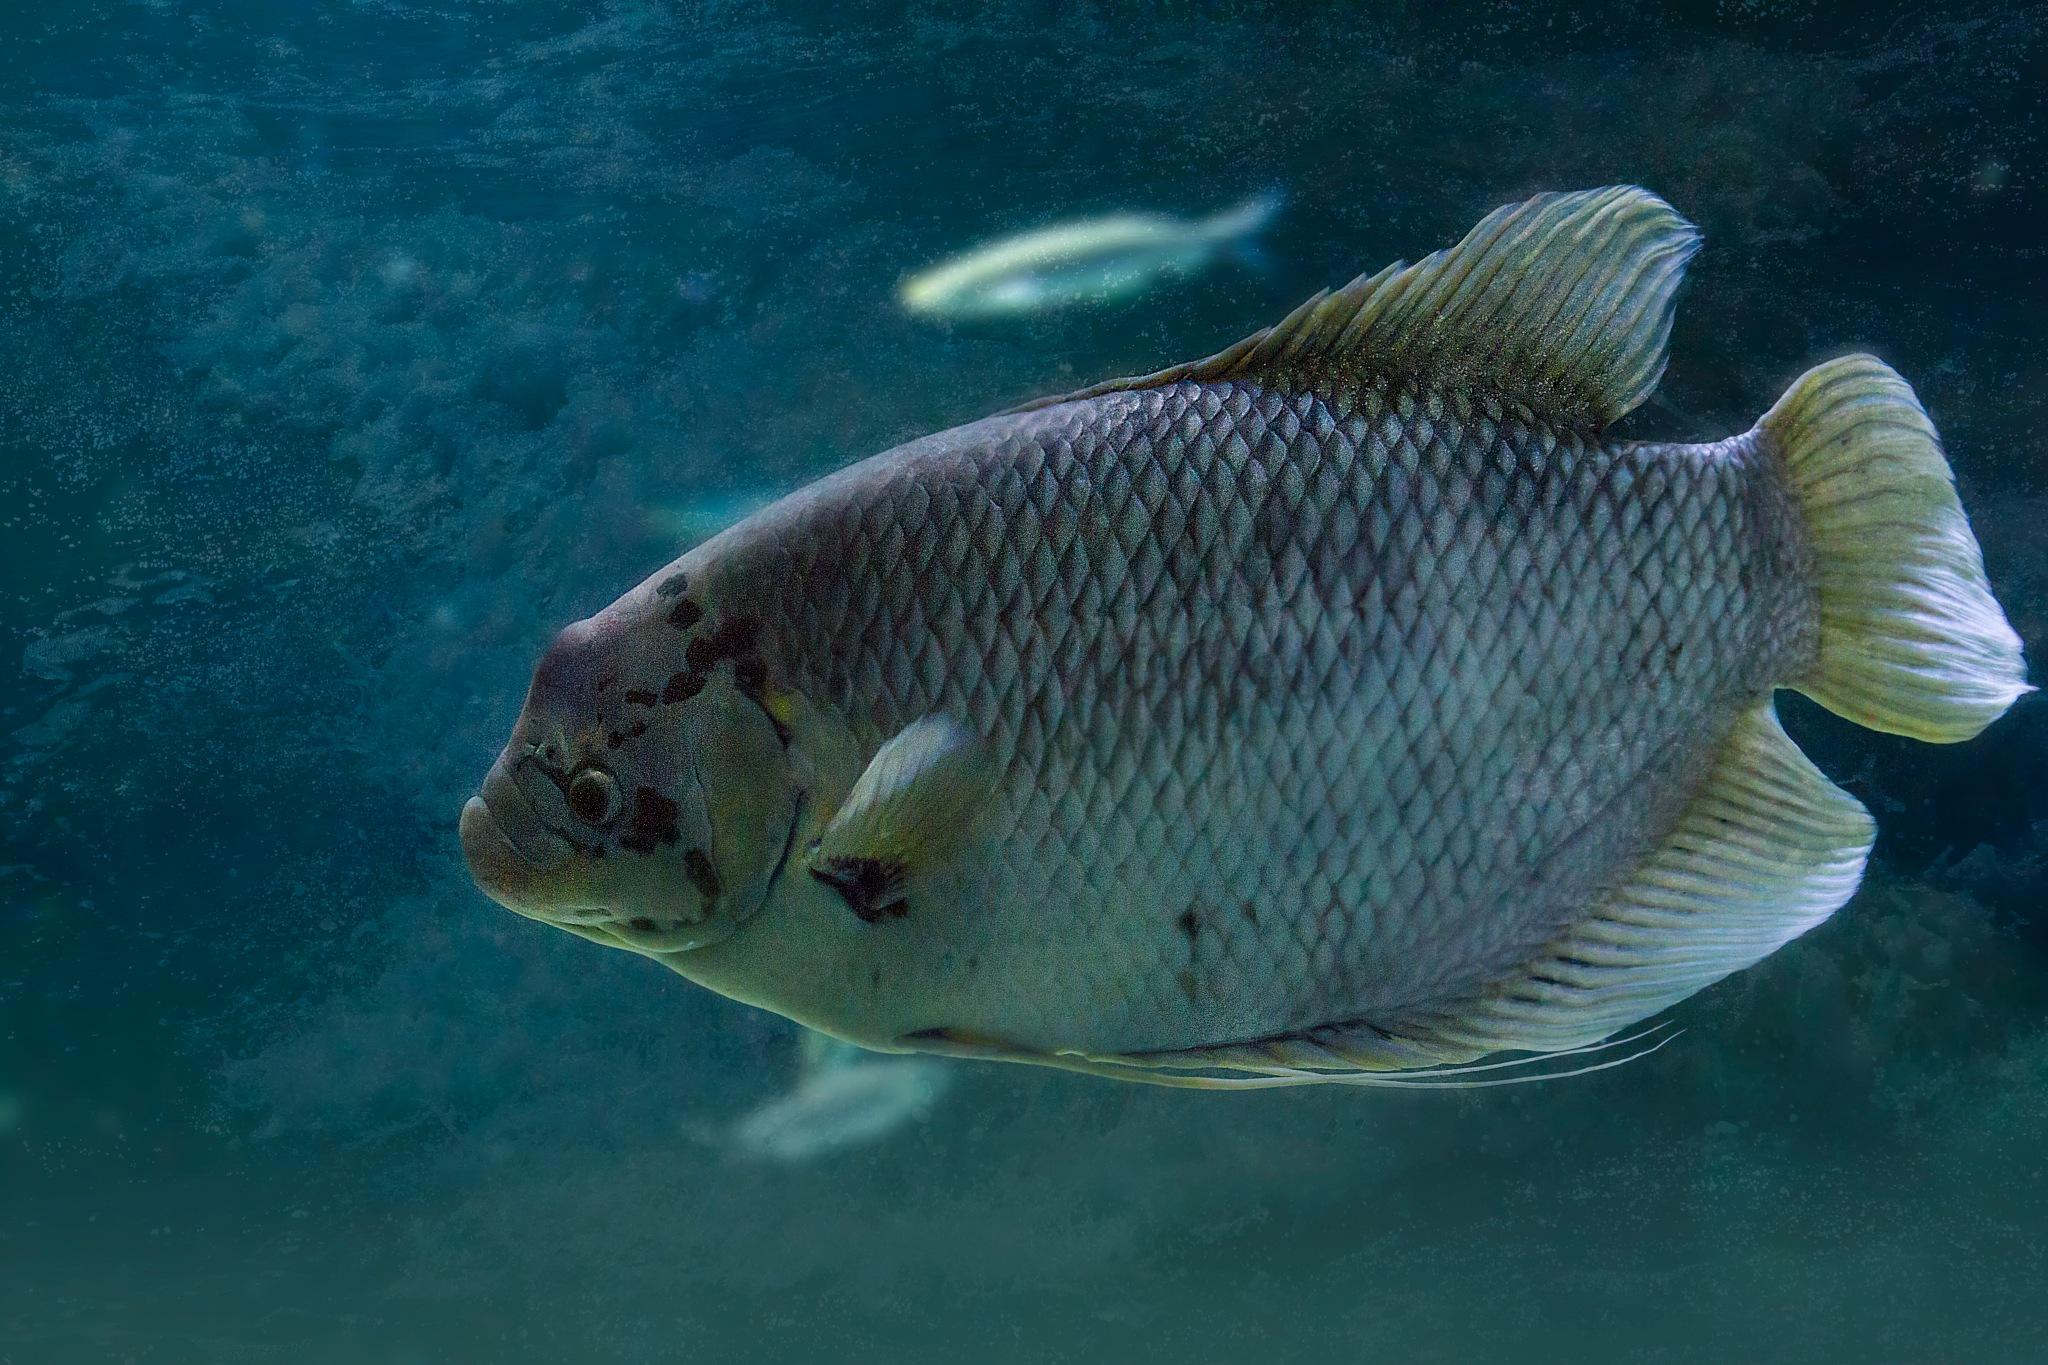 seawater fish by Renaat